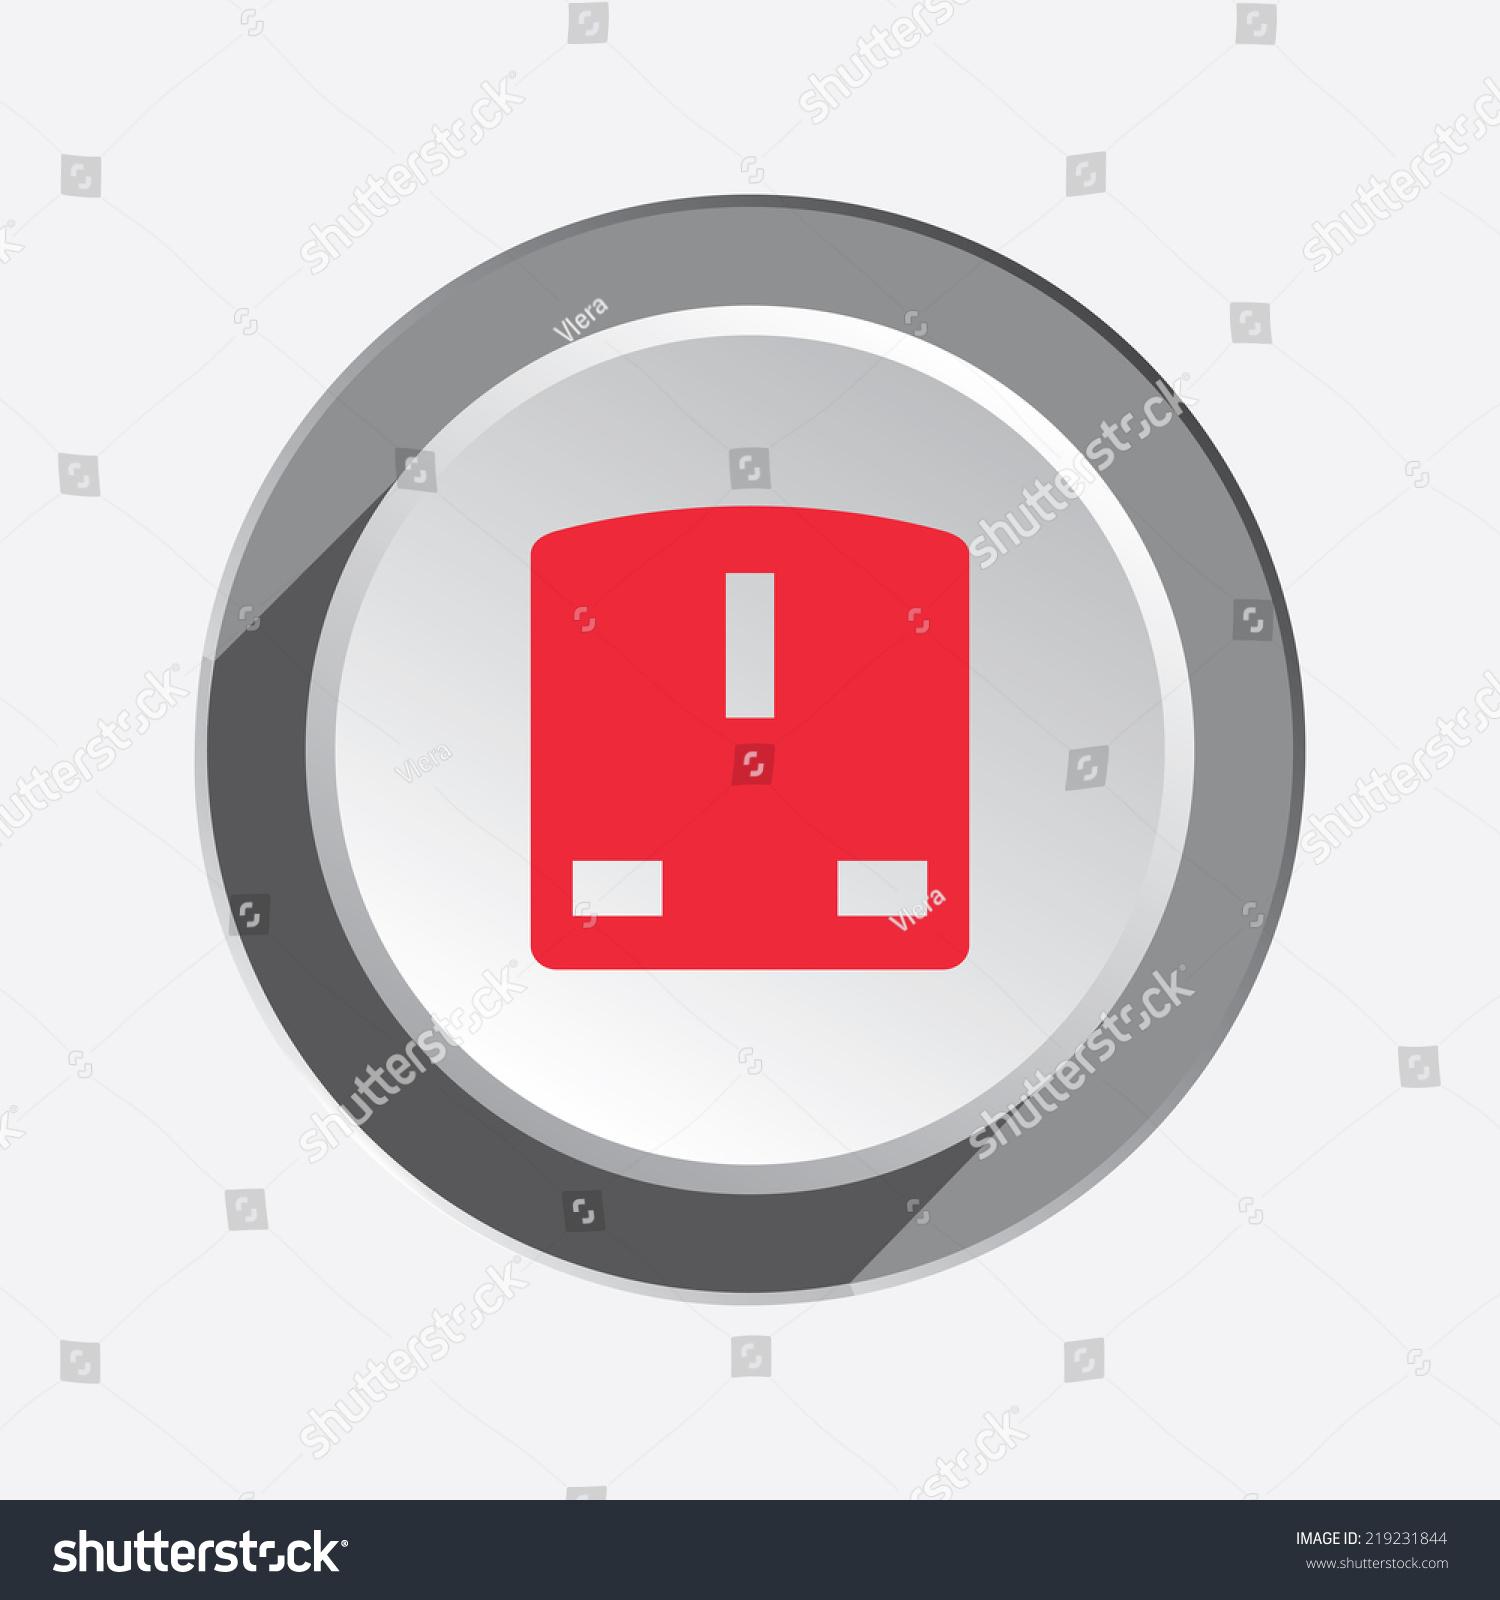 Plug Power Stock Quote: Electric Plug, Socket Base Icon. British Standard. Power